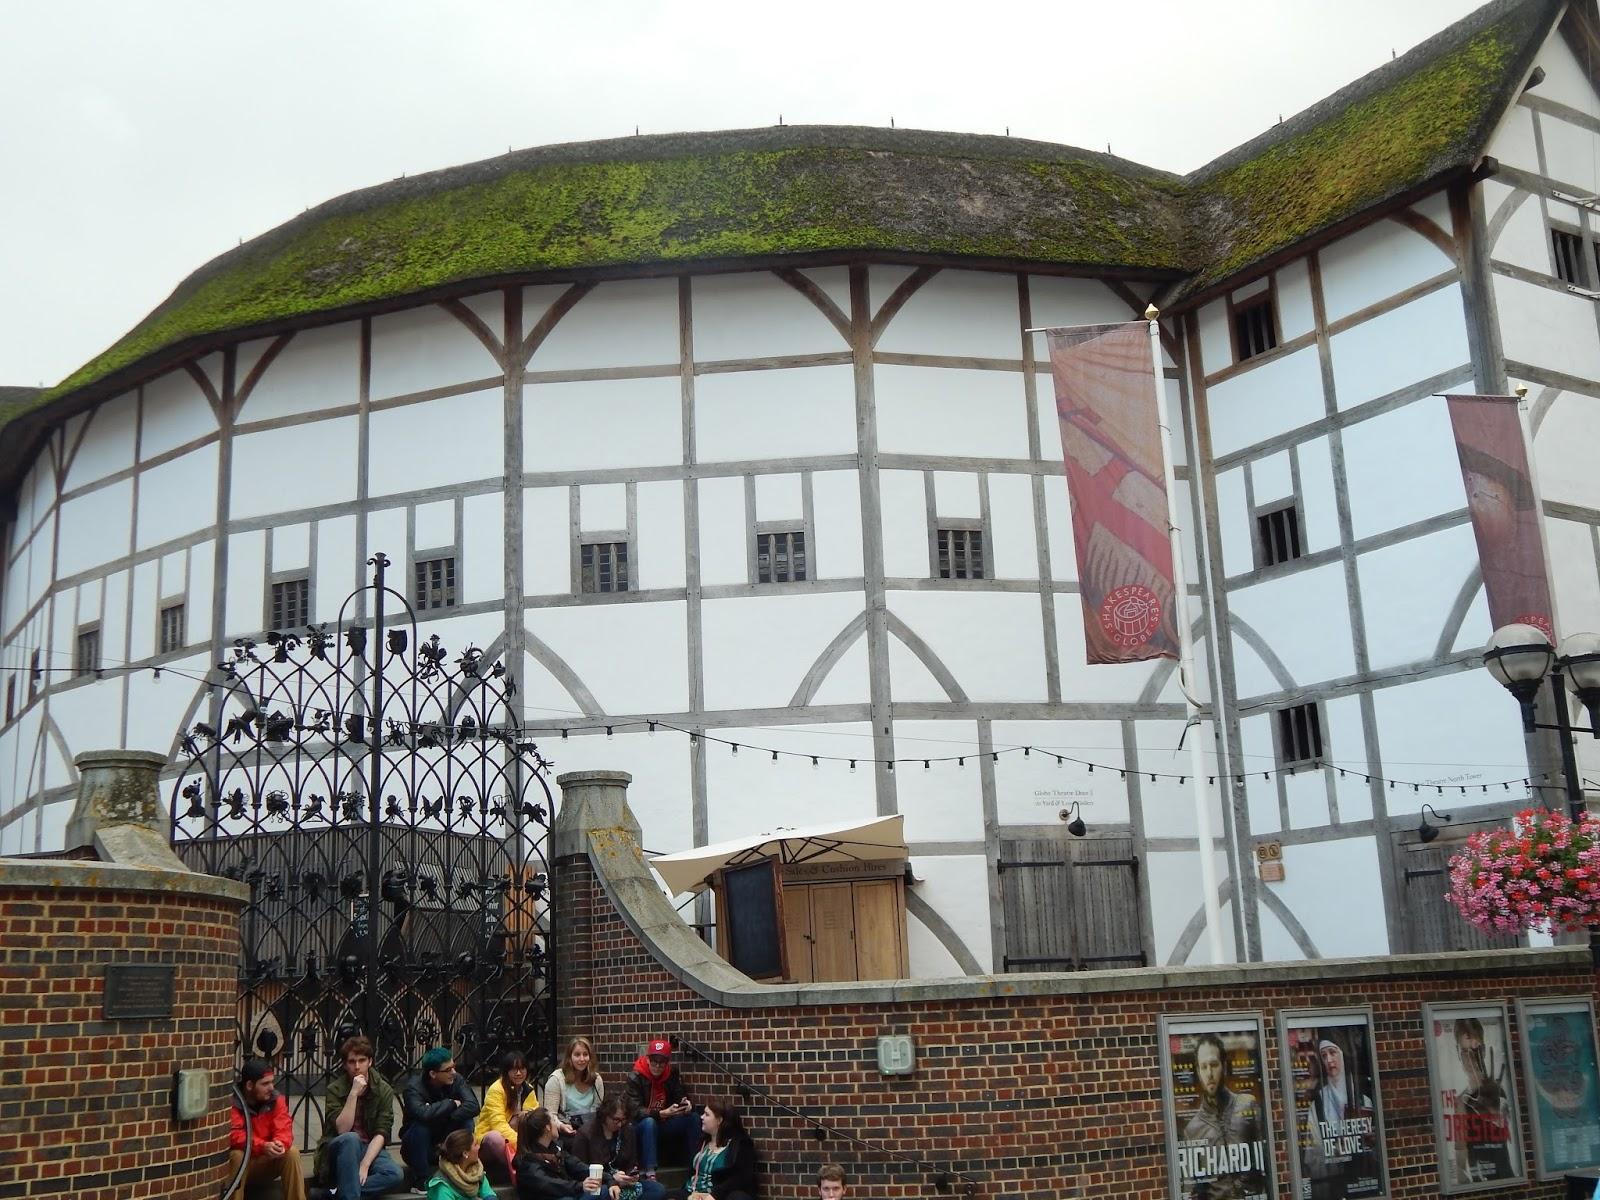 Shakespearovo divadlo Globe